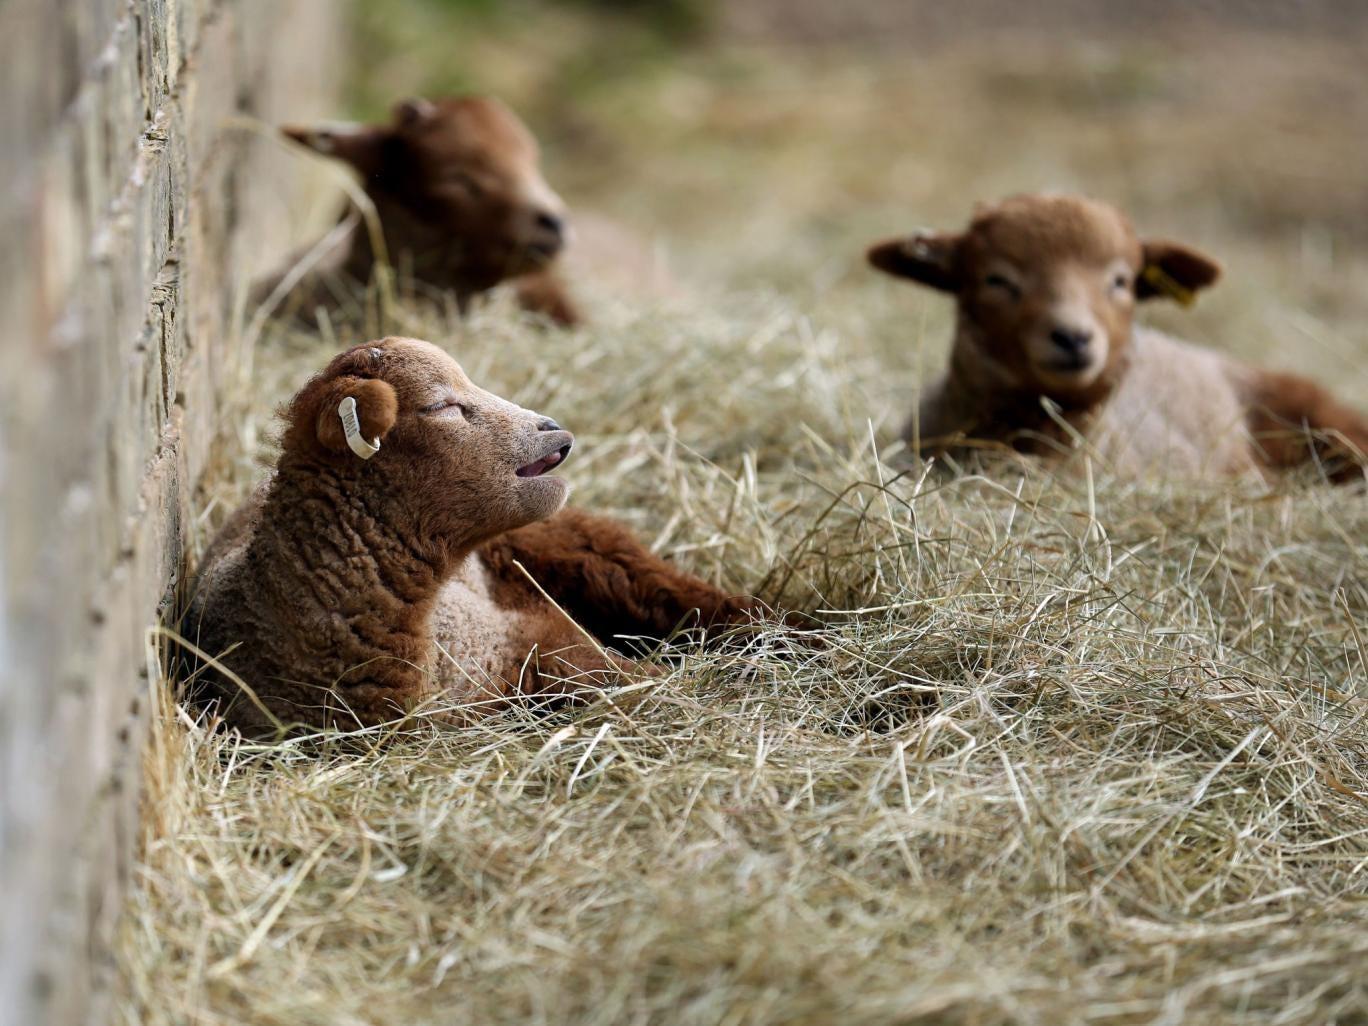 Rare breed newborn Portland lambs soak up the early spring sunshine at  Wimpole Hall farm in Cambridgeshire